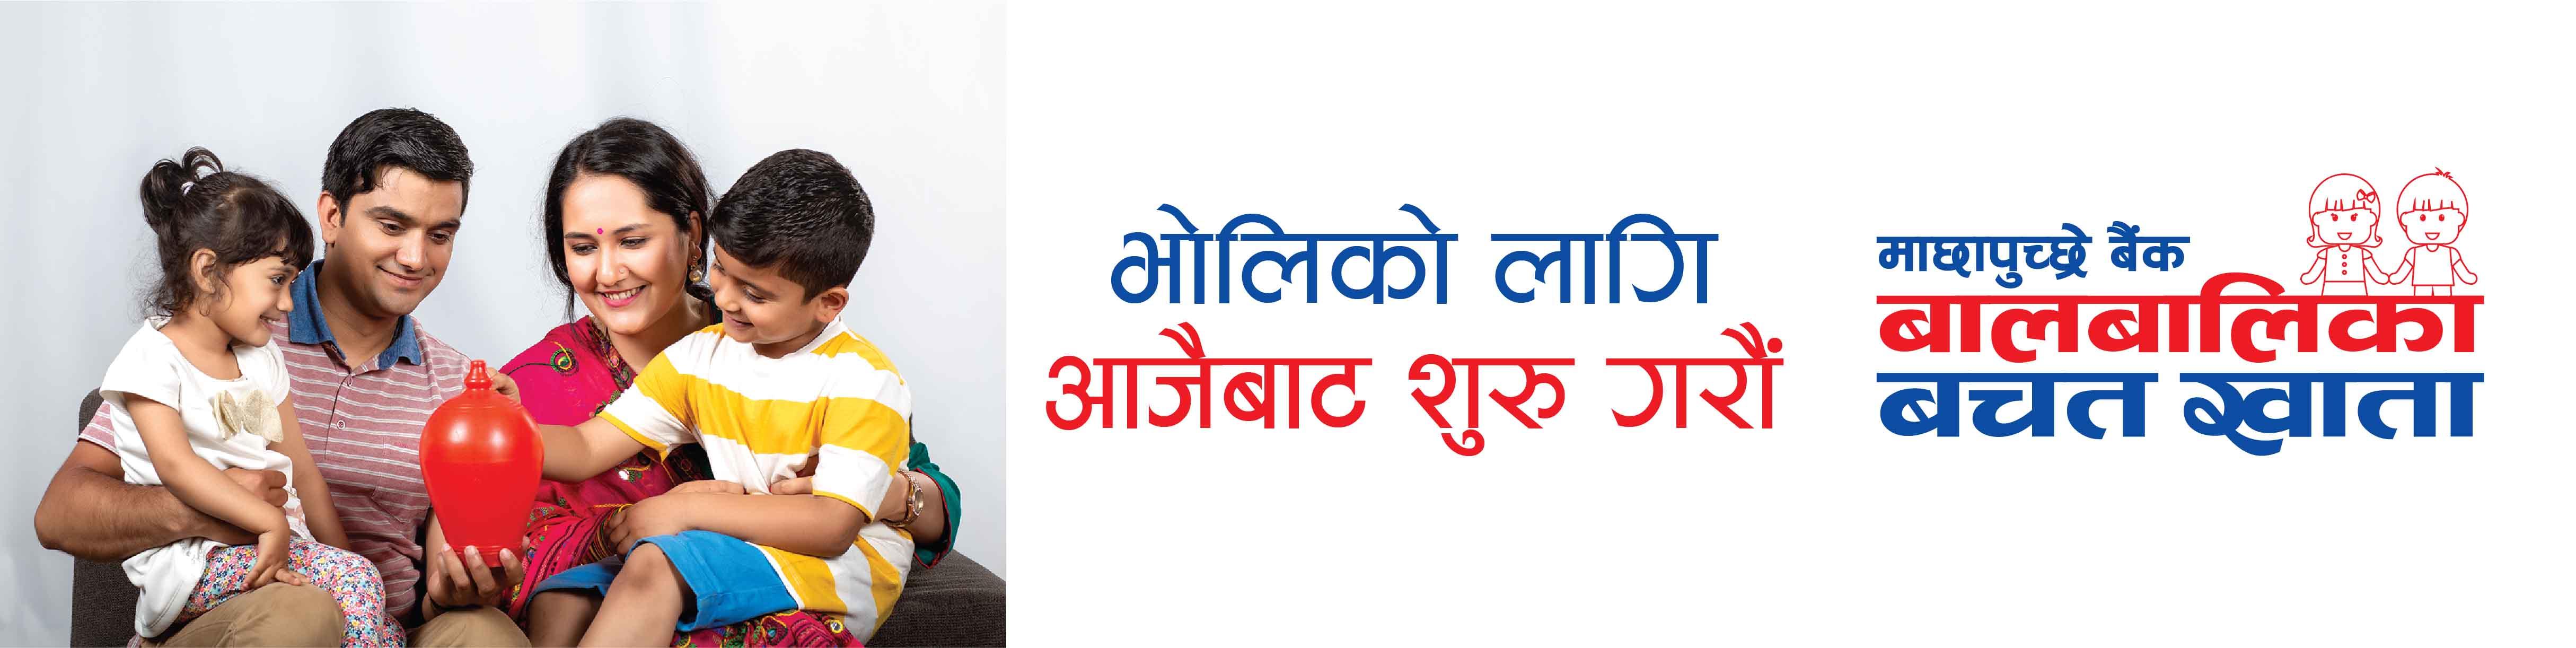 MBL Balbalika Bachat Khata